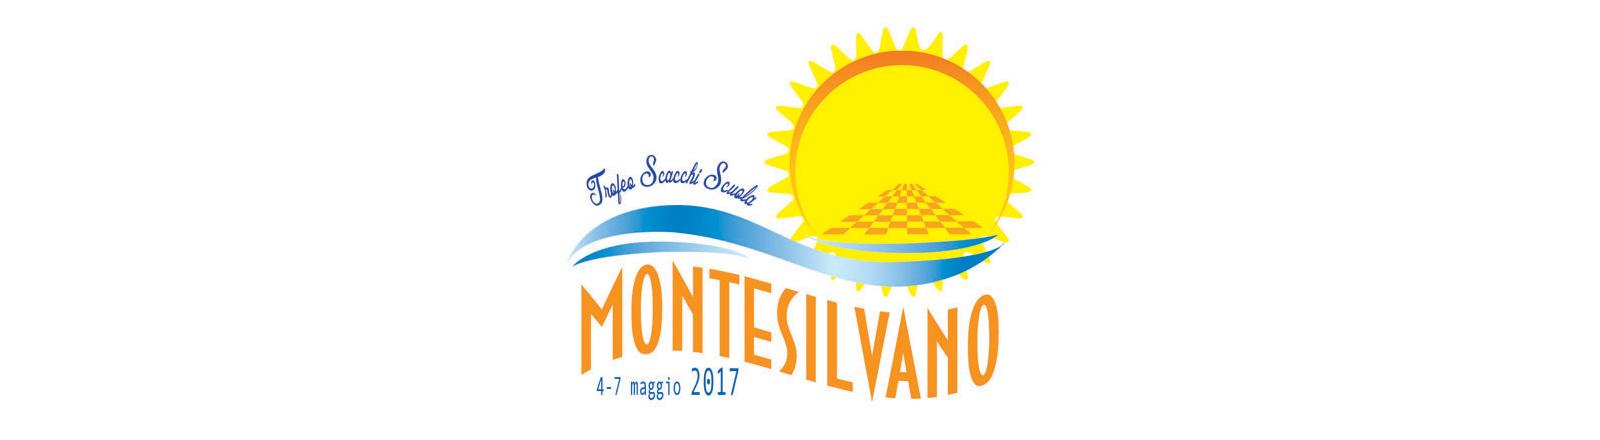 Montesilvano (PE)